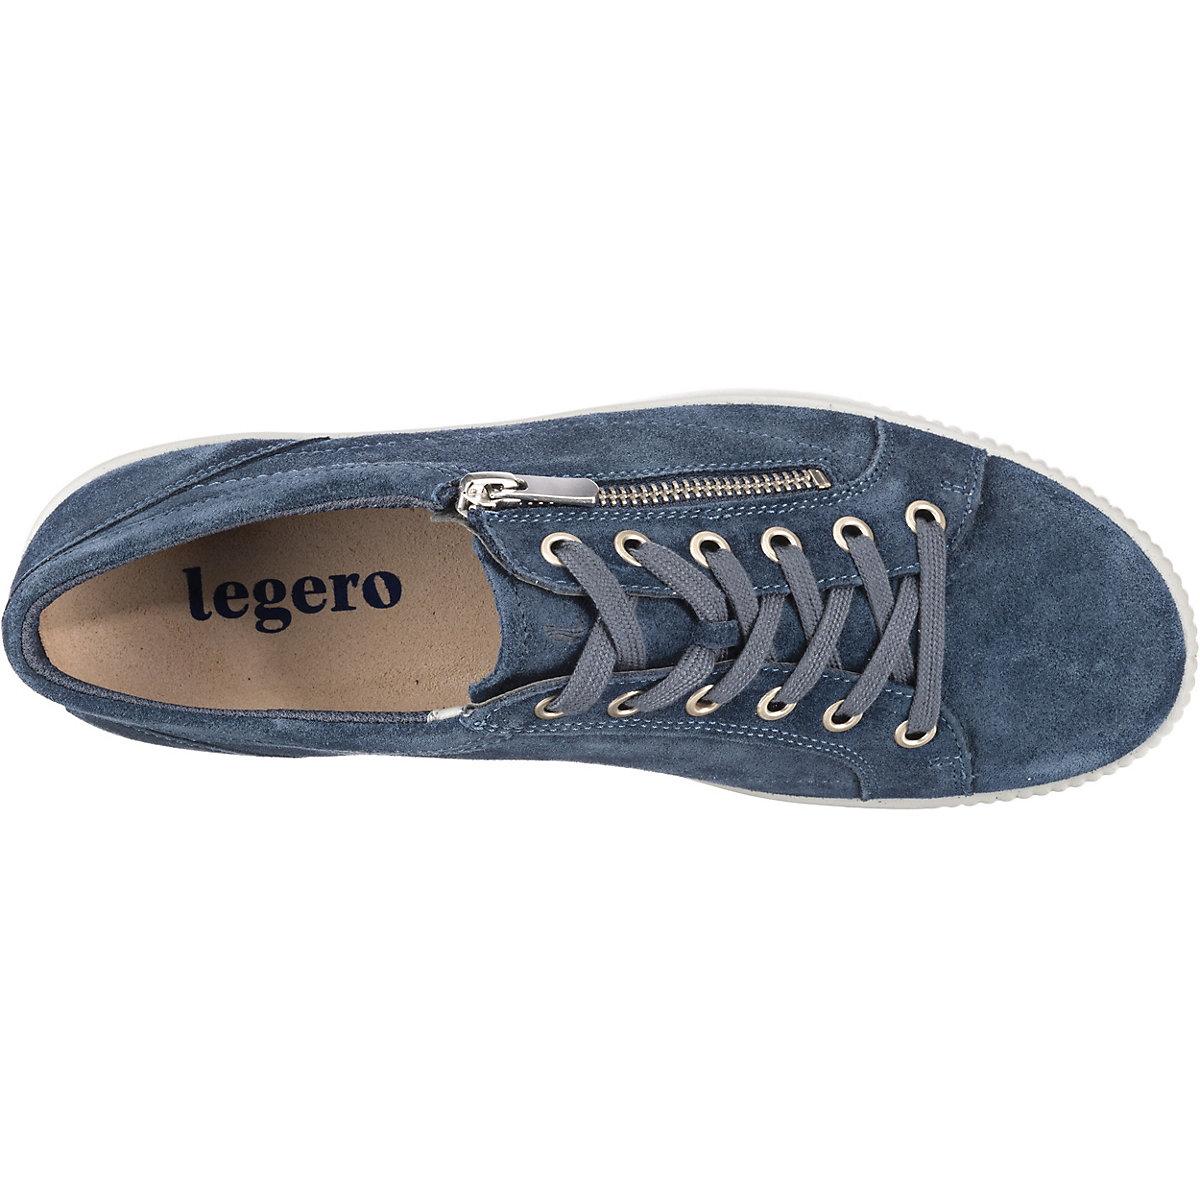 legero Tanaro 4.0 Sportliche Halbschuhe blau